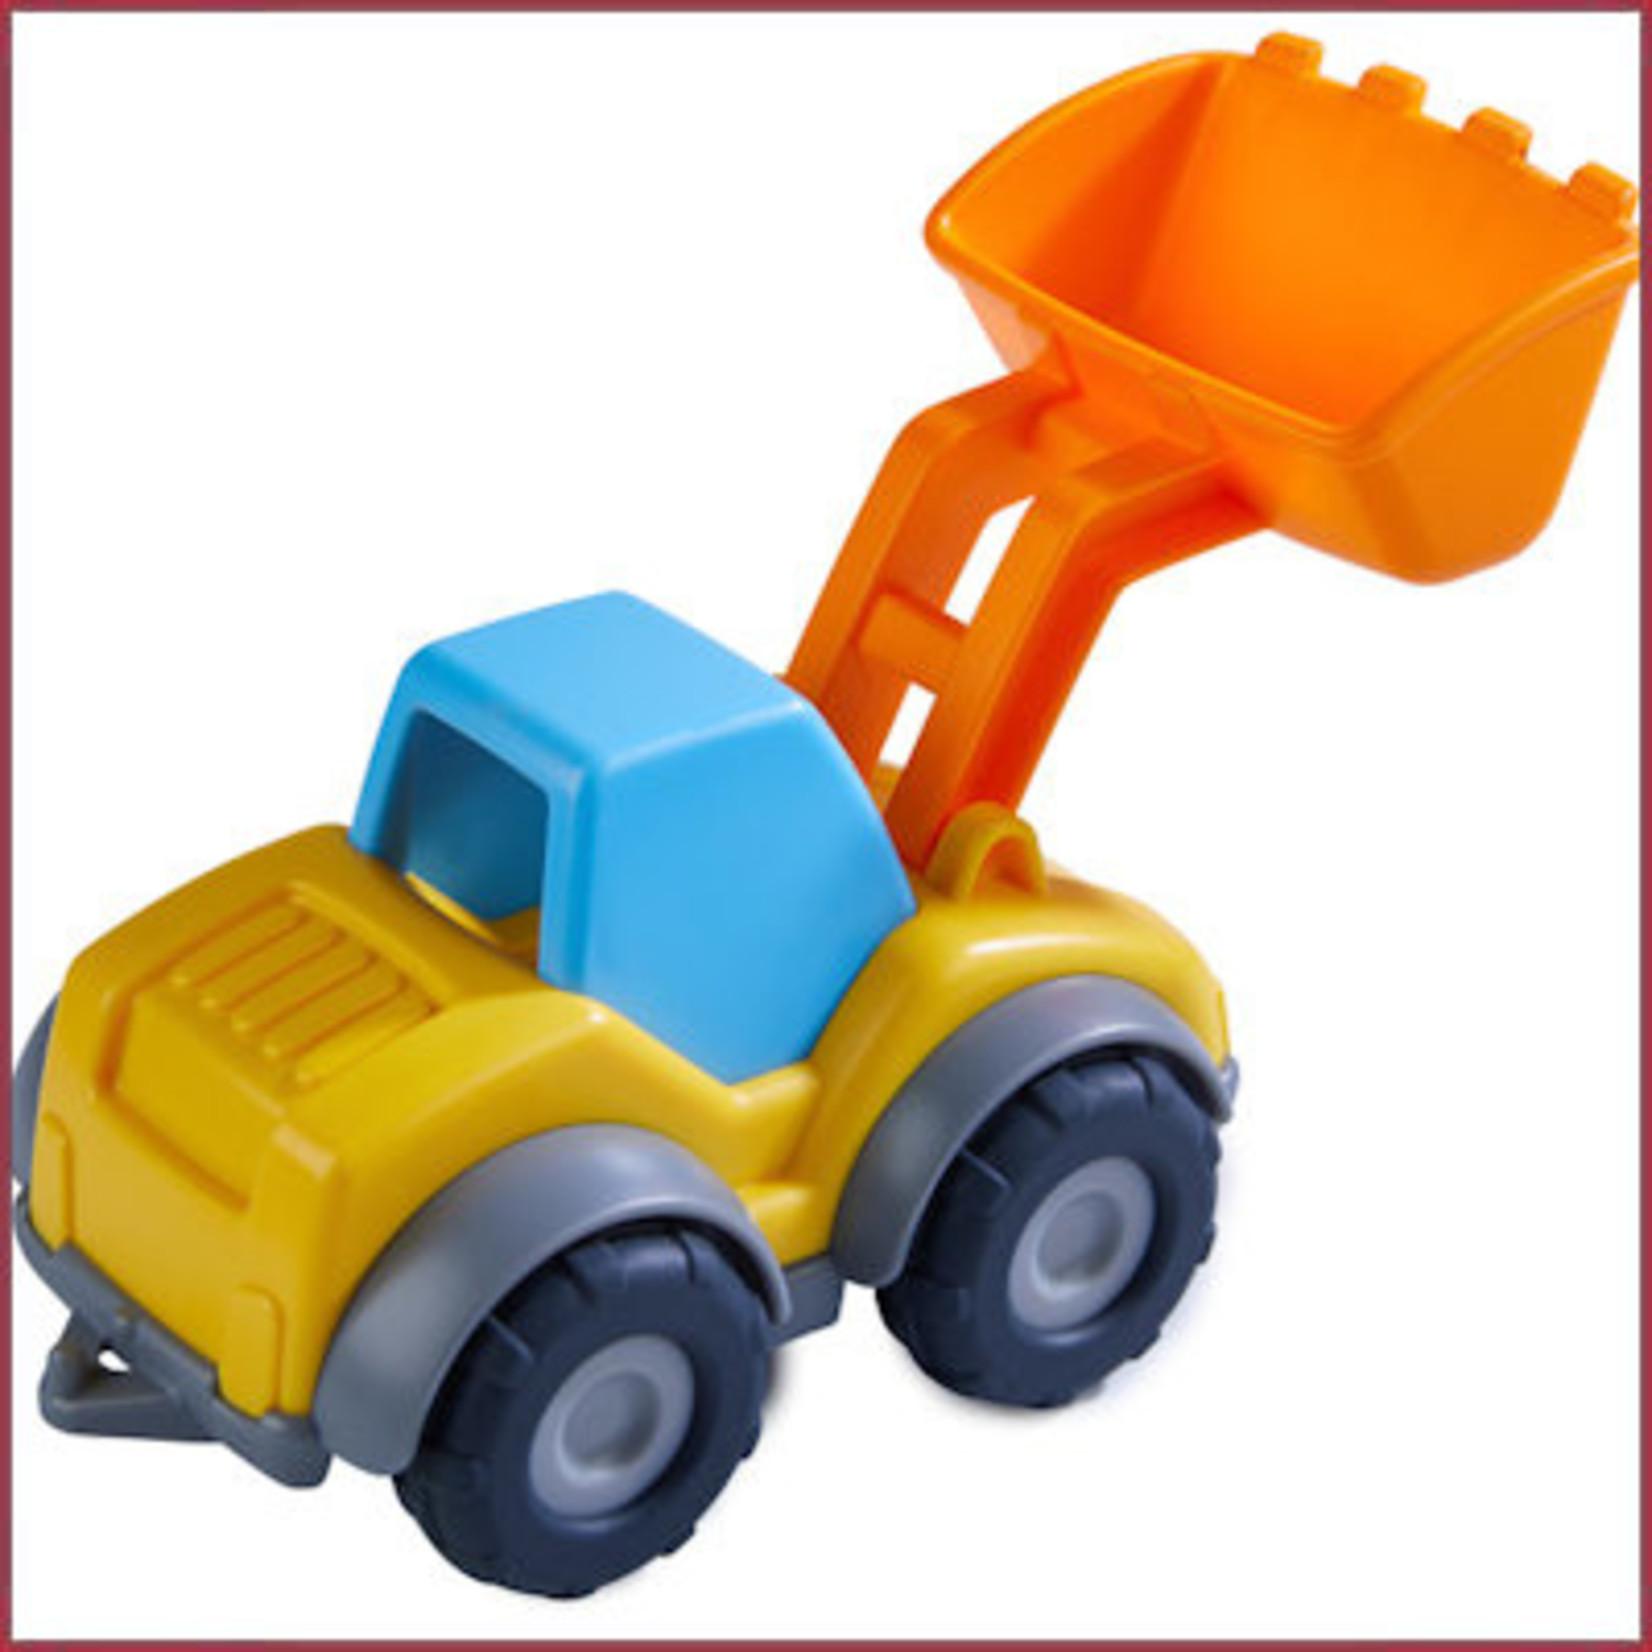 Haba Haba Speelgoedauto plastic